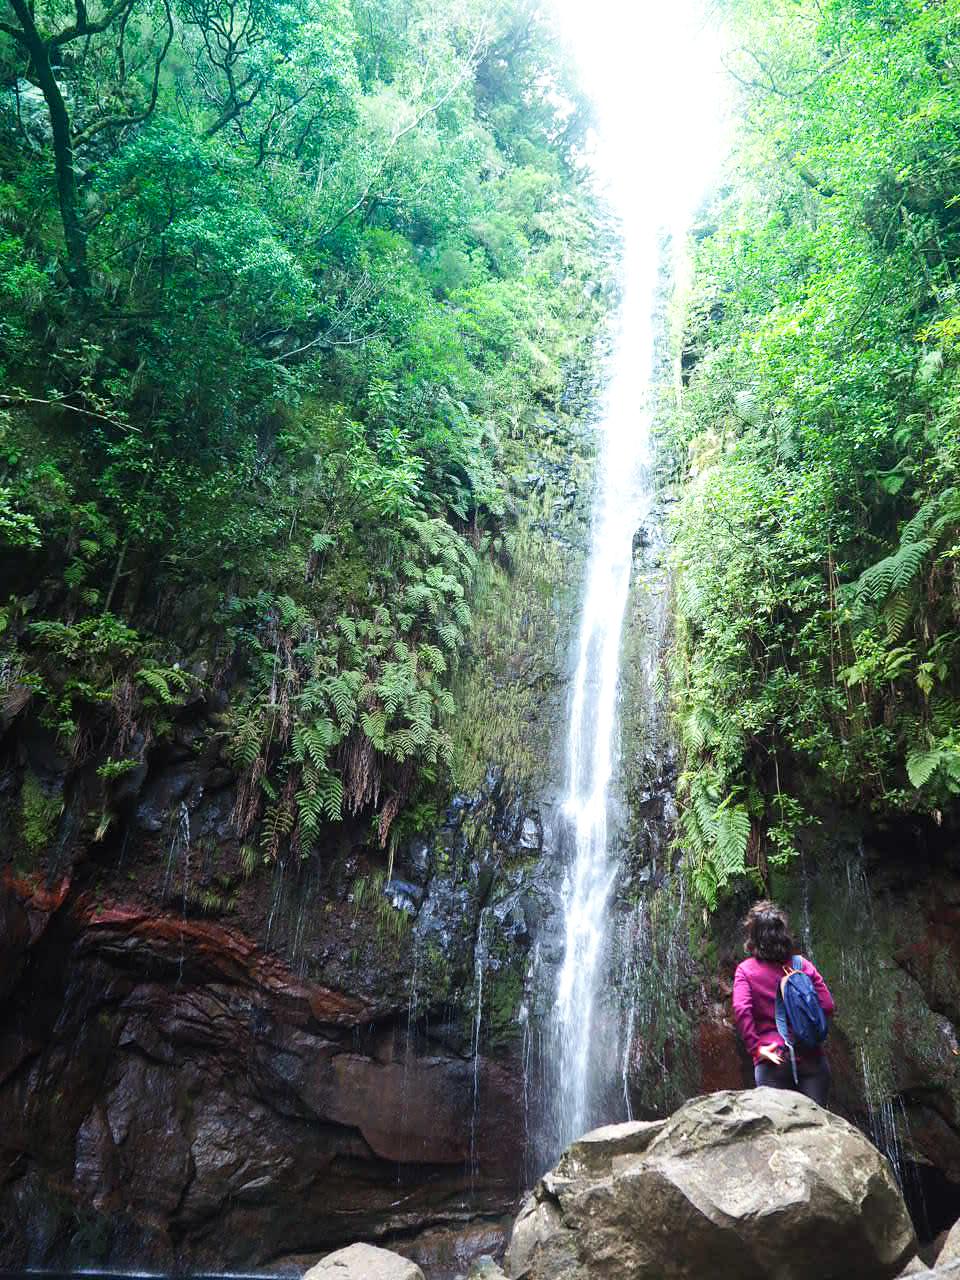 cascade randonnee des 25 fontaines Madere clioandco verdure